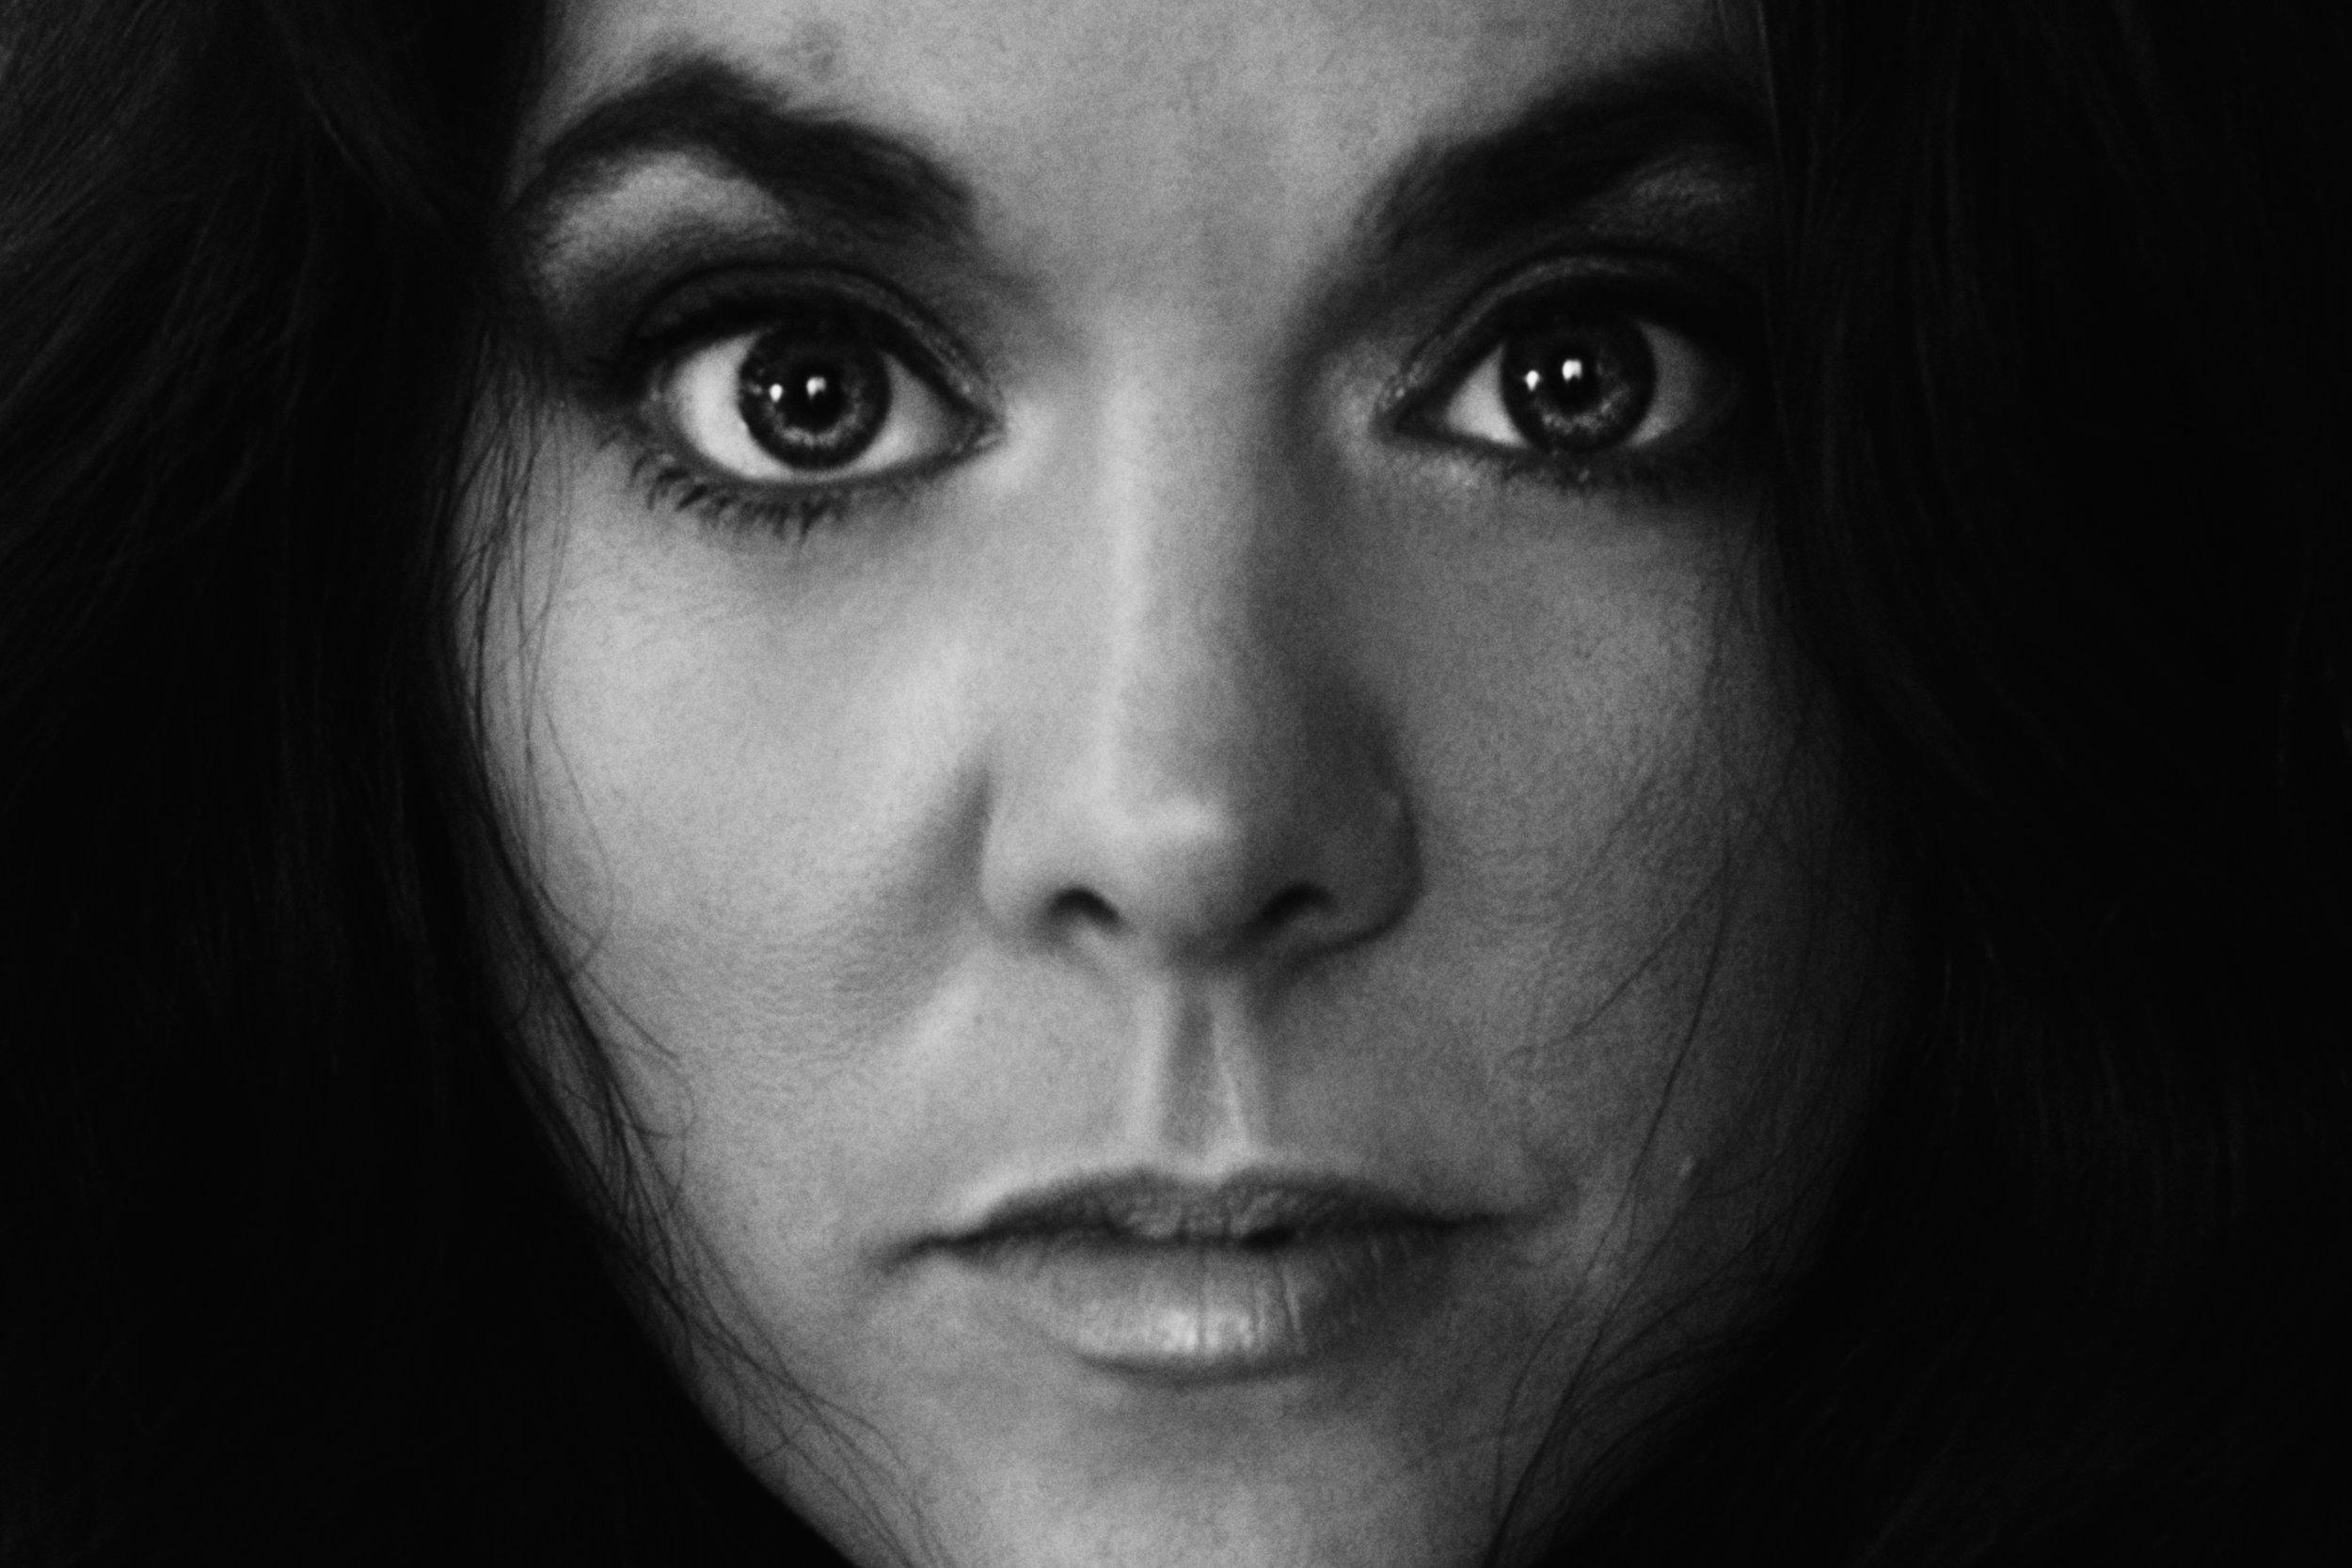 self portrait - light and dark - black and white